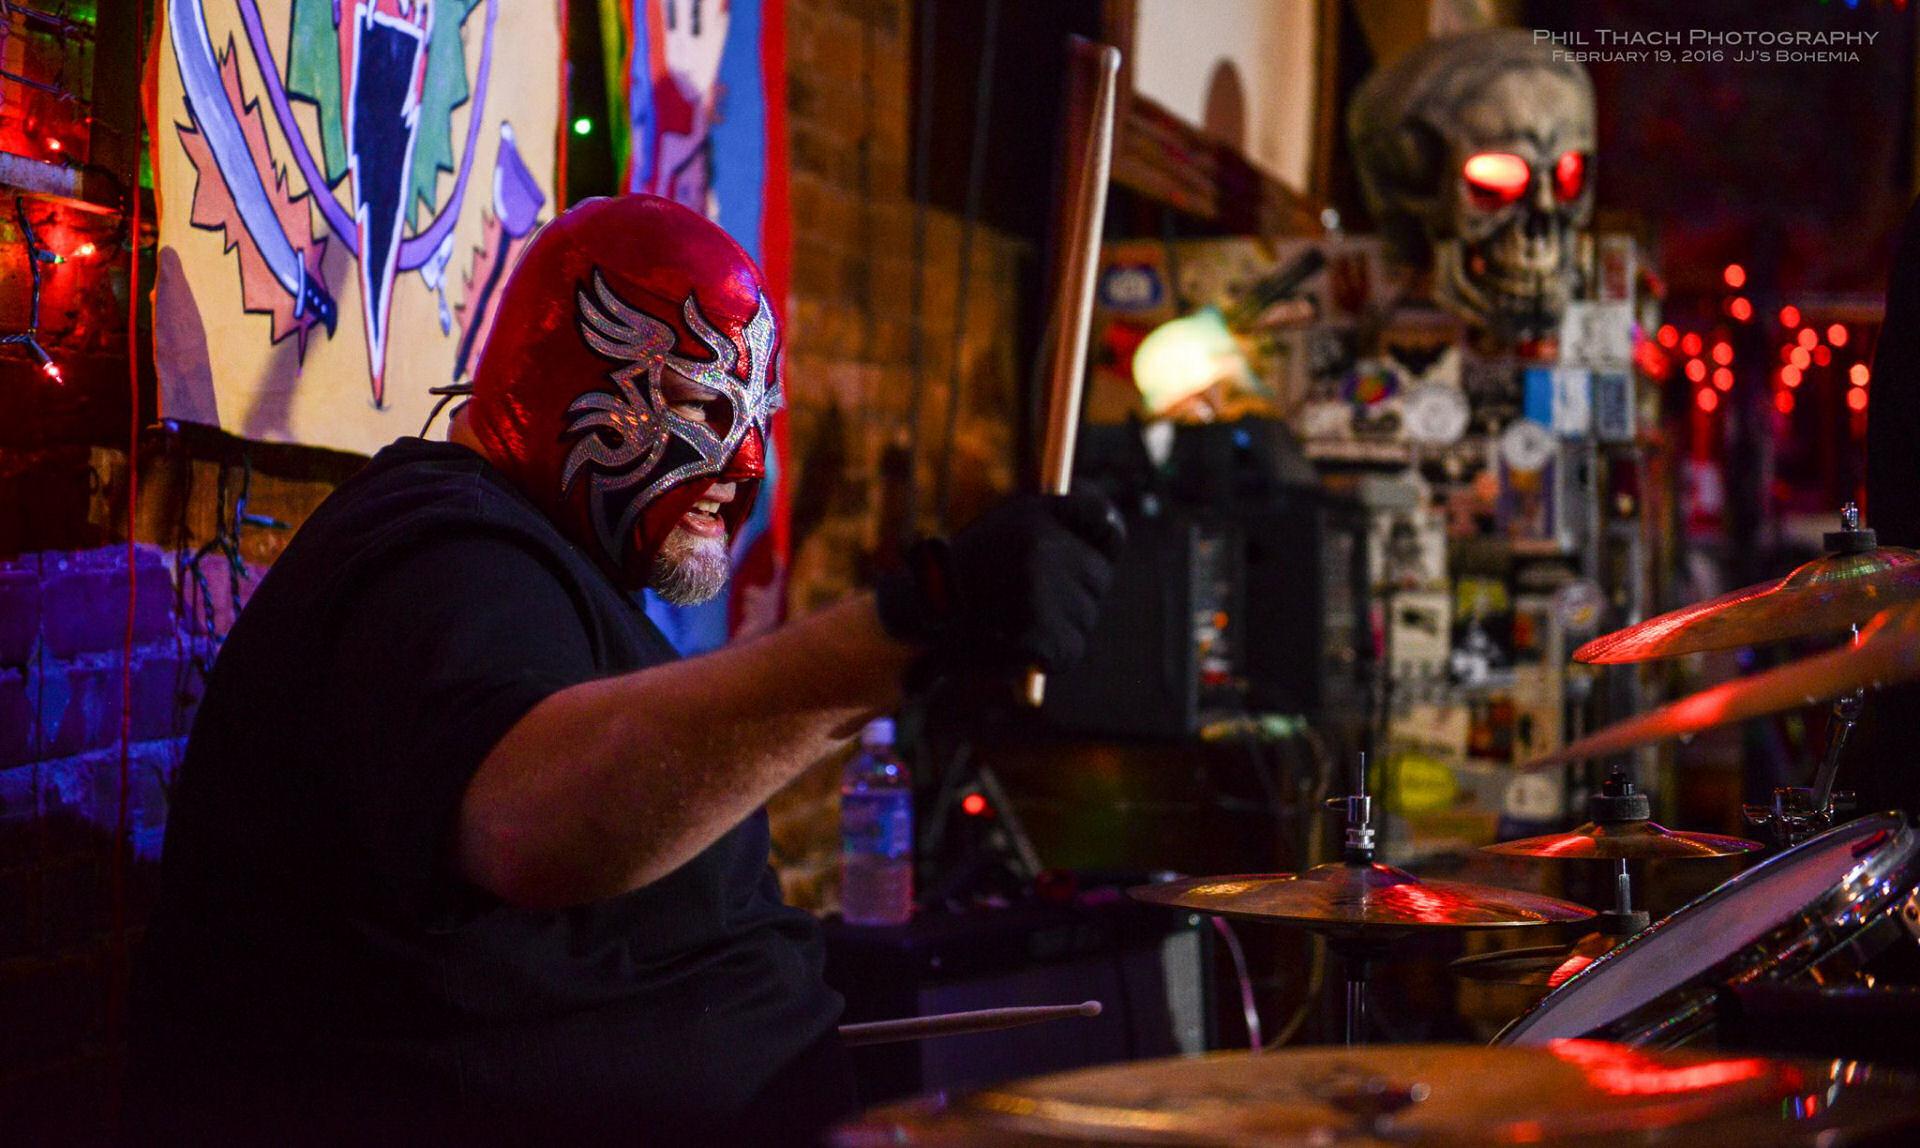 Fatsquatch drumming with Genki Genki Panic at JJ's Bohemia